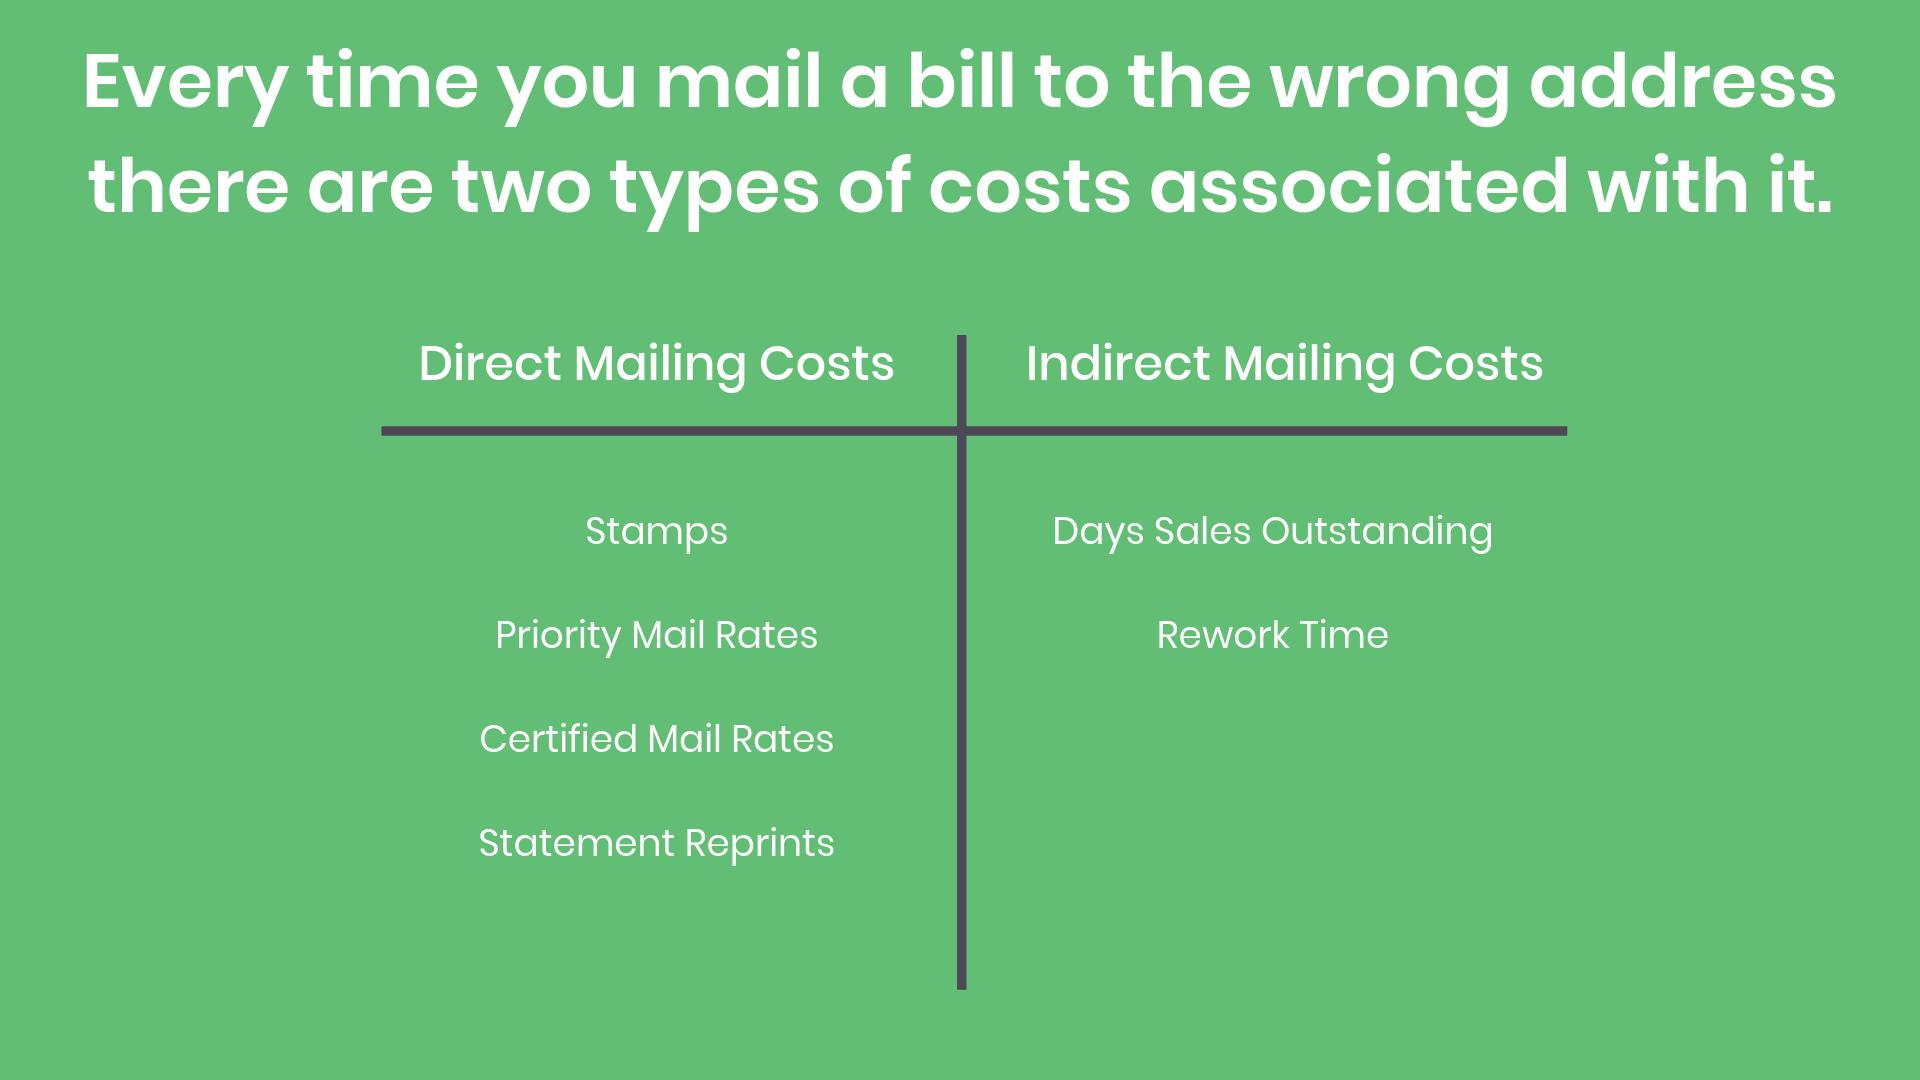 directmailingvsindirectmailingcosts_072019.png